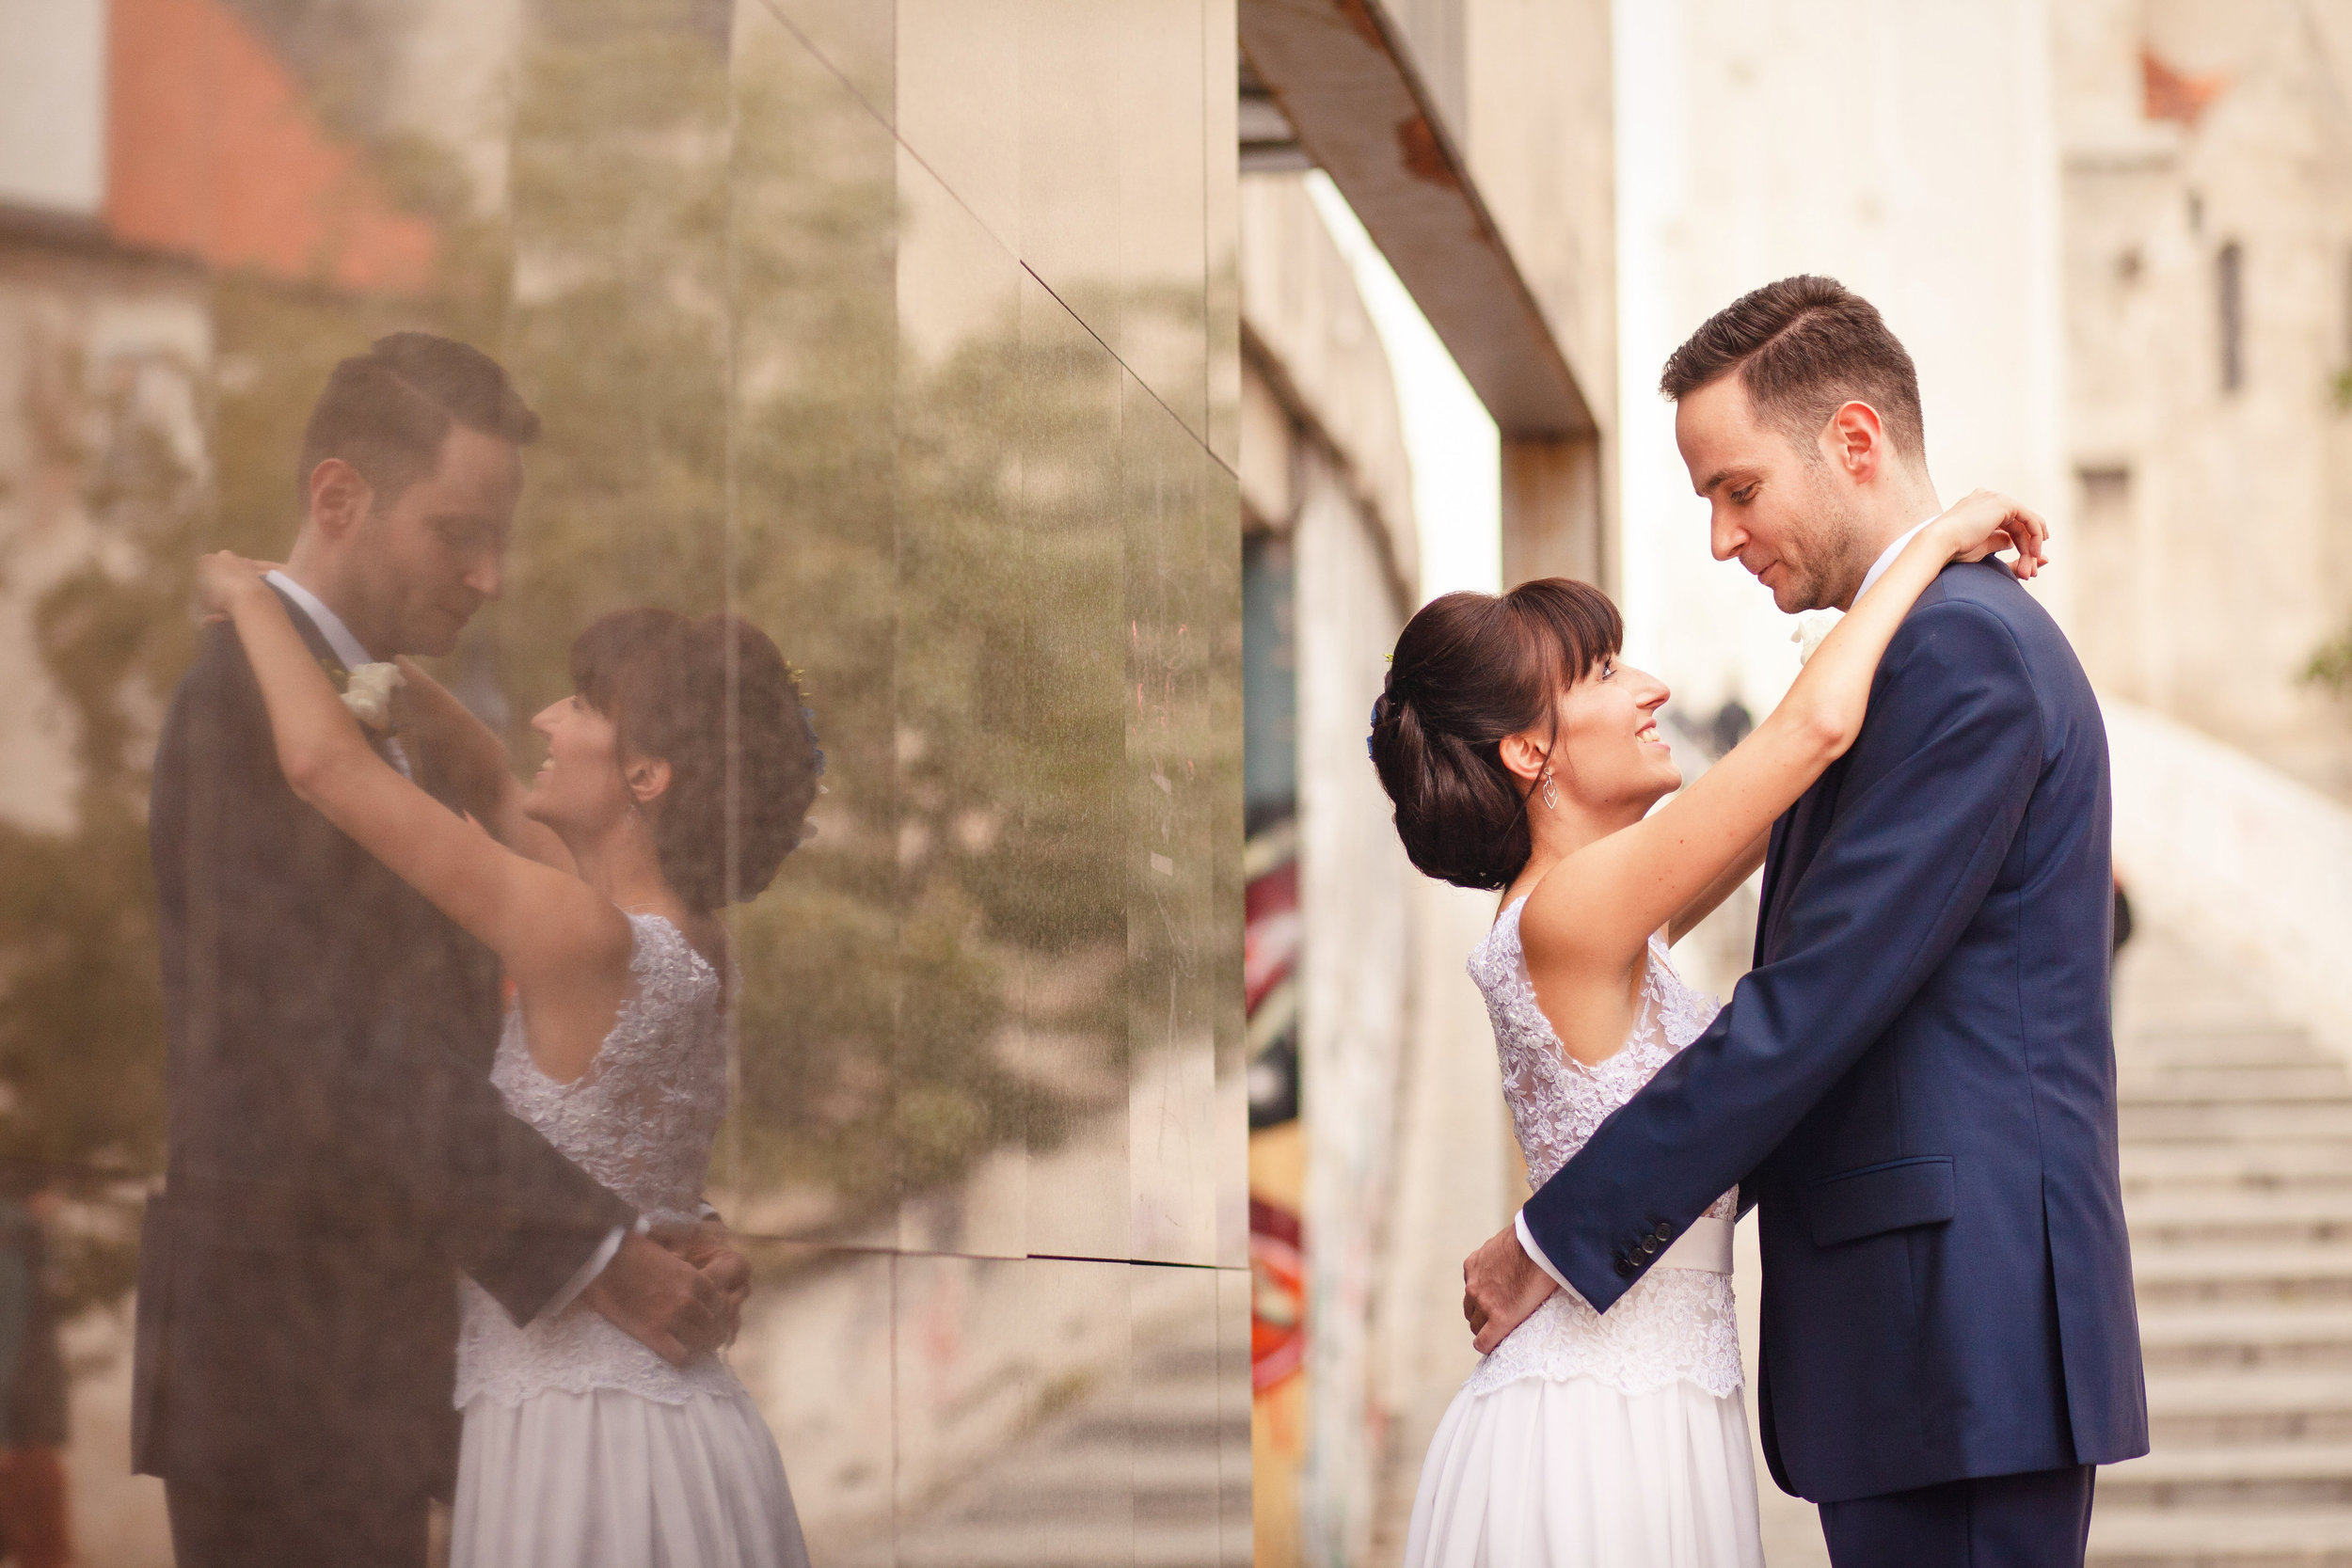 destination-wedding-photographer-bratislava-slovakia-europe-portrait-session-1.jpg